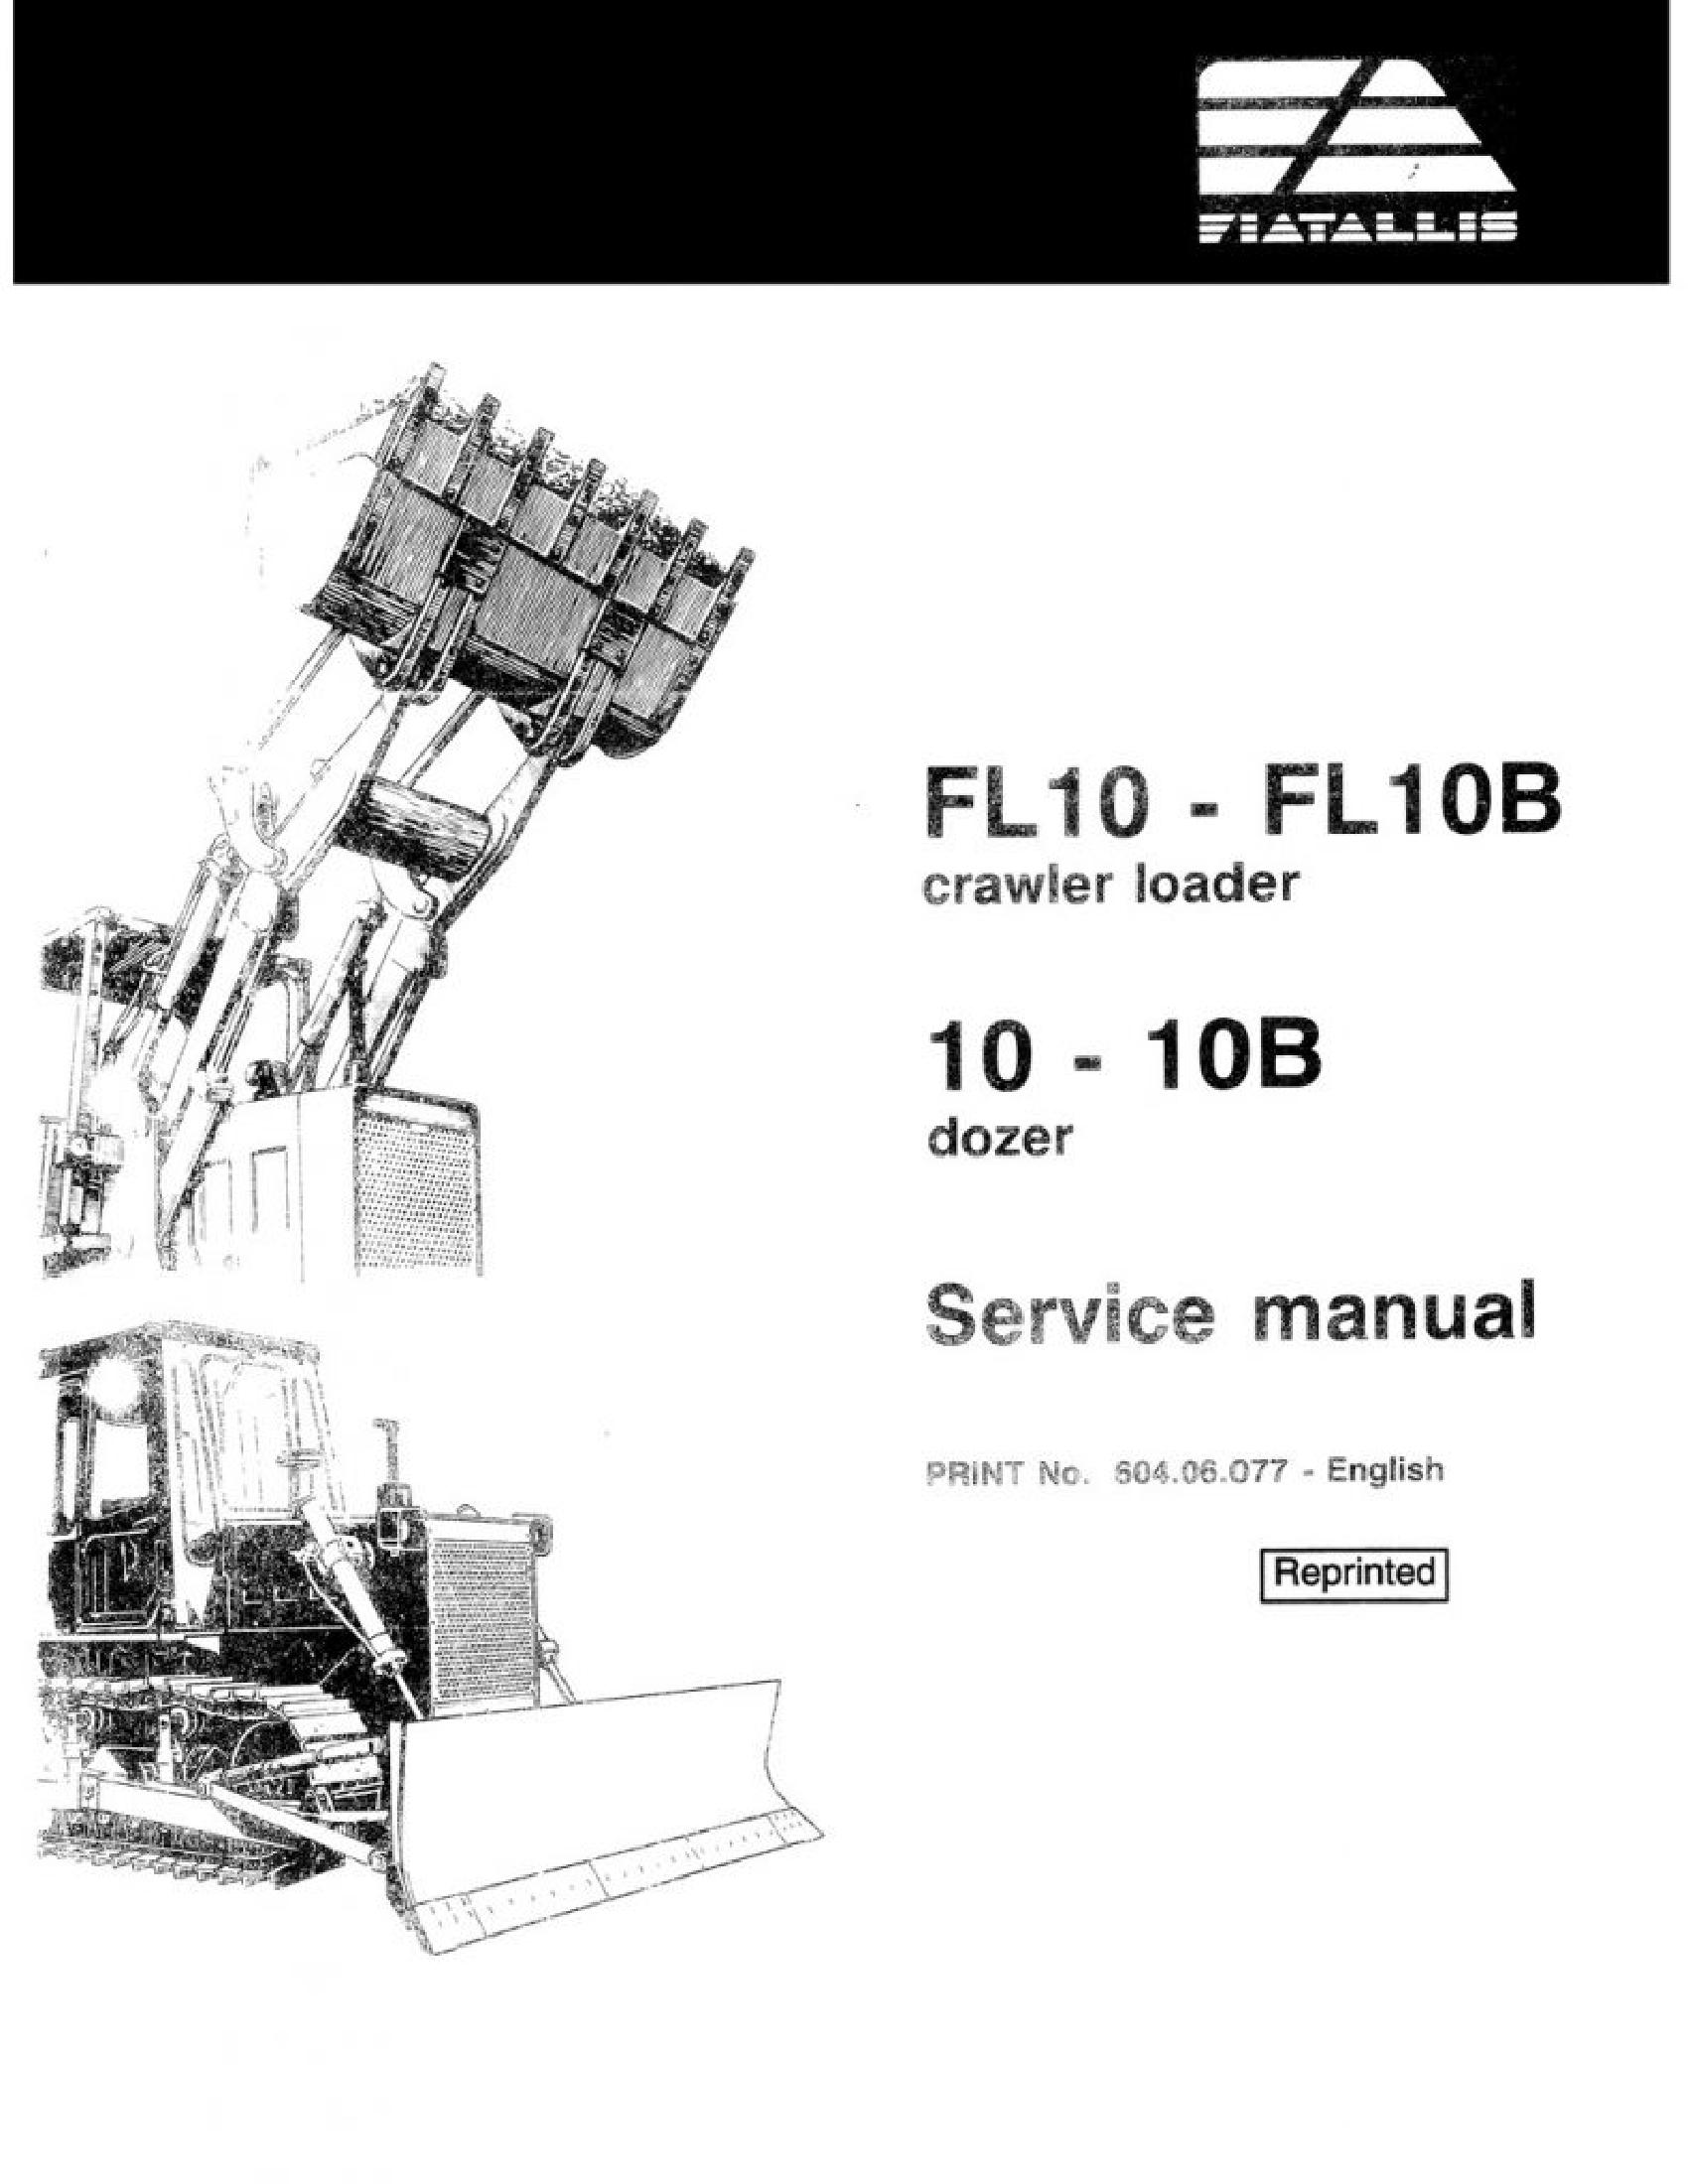 Fiat-Allis FL10 Crawler Dozer manual